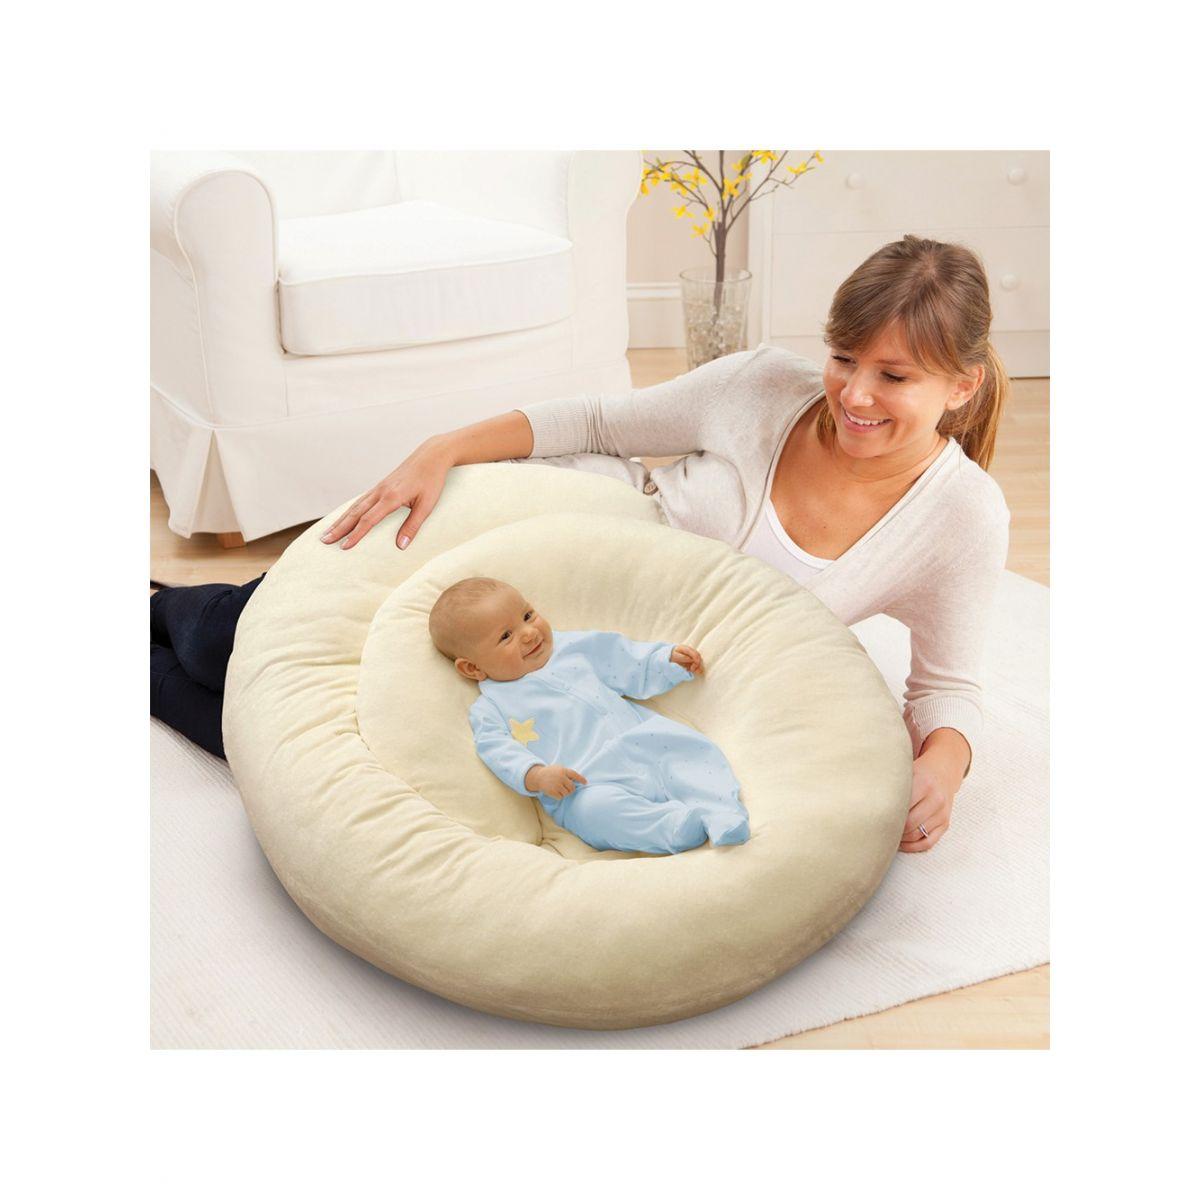 bd3595403 Almohada para el Embarazo MultiPropósito de Summer Infant